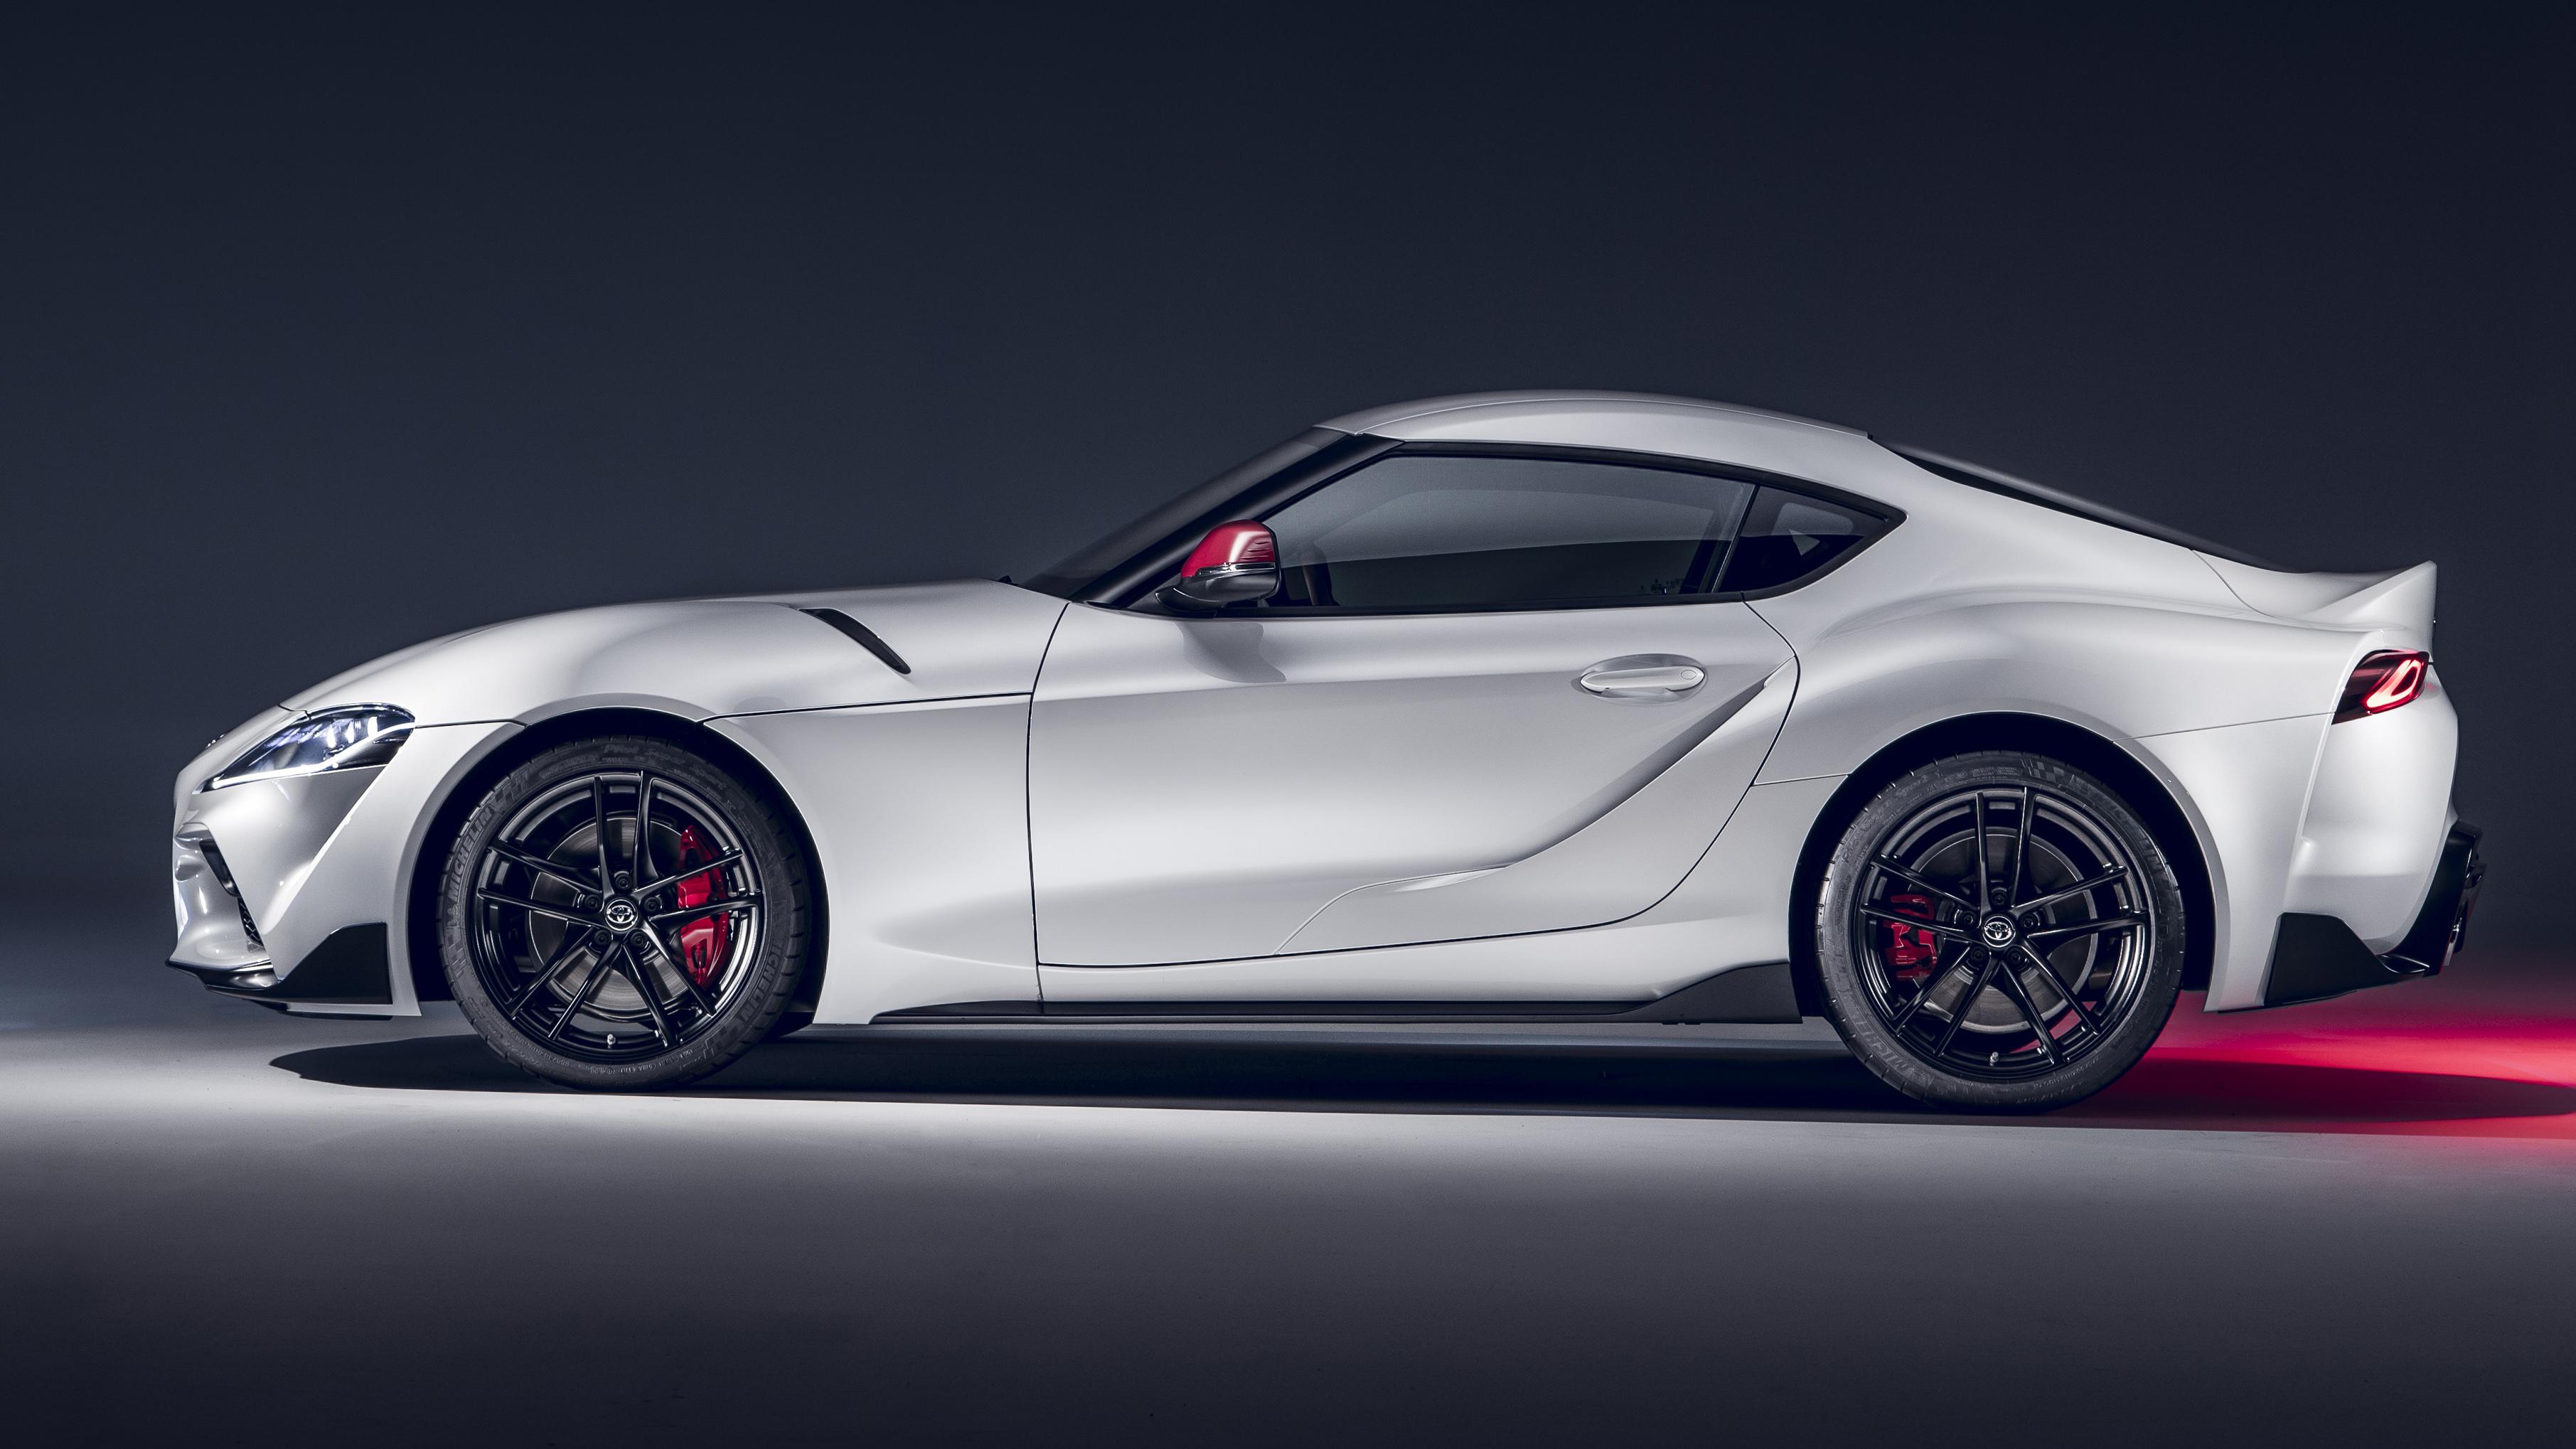 2020 Toyota Supra four-cylinder